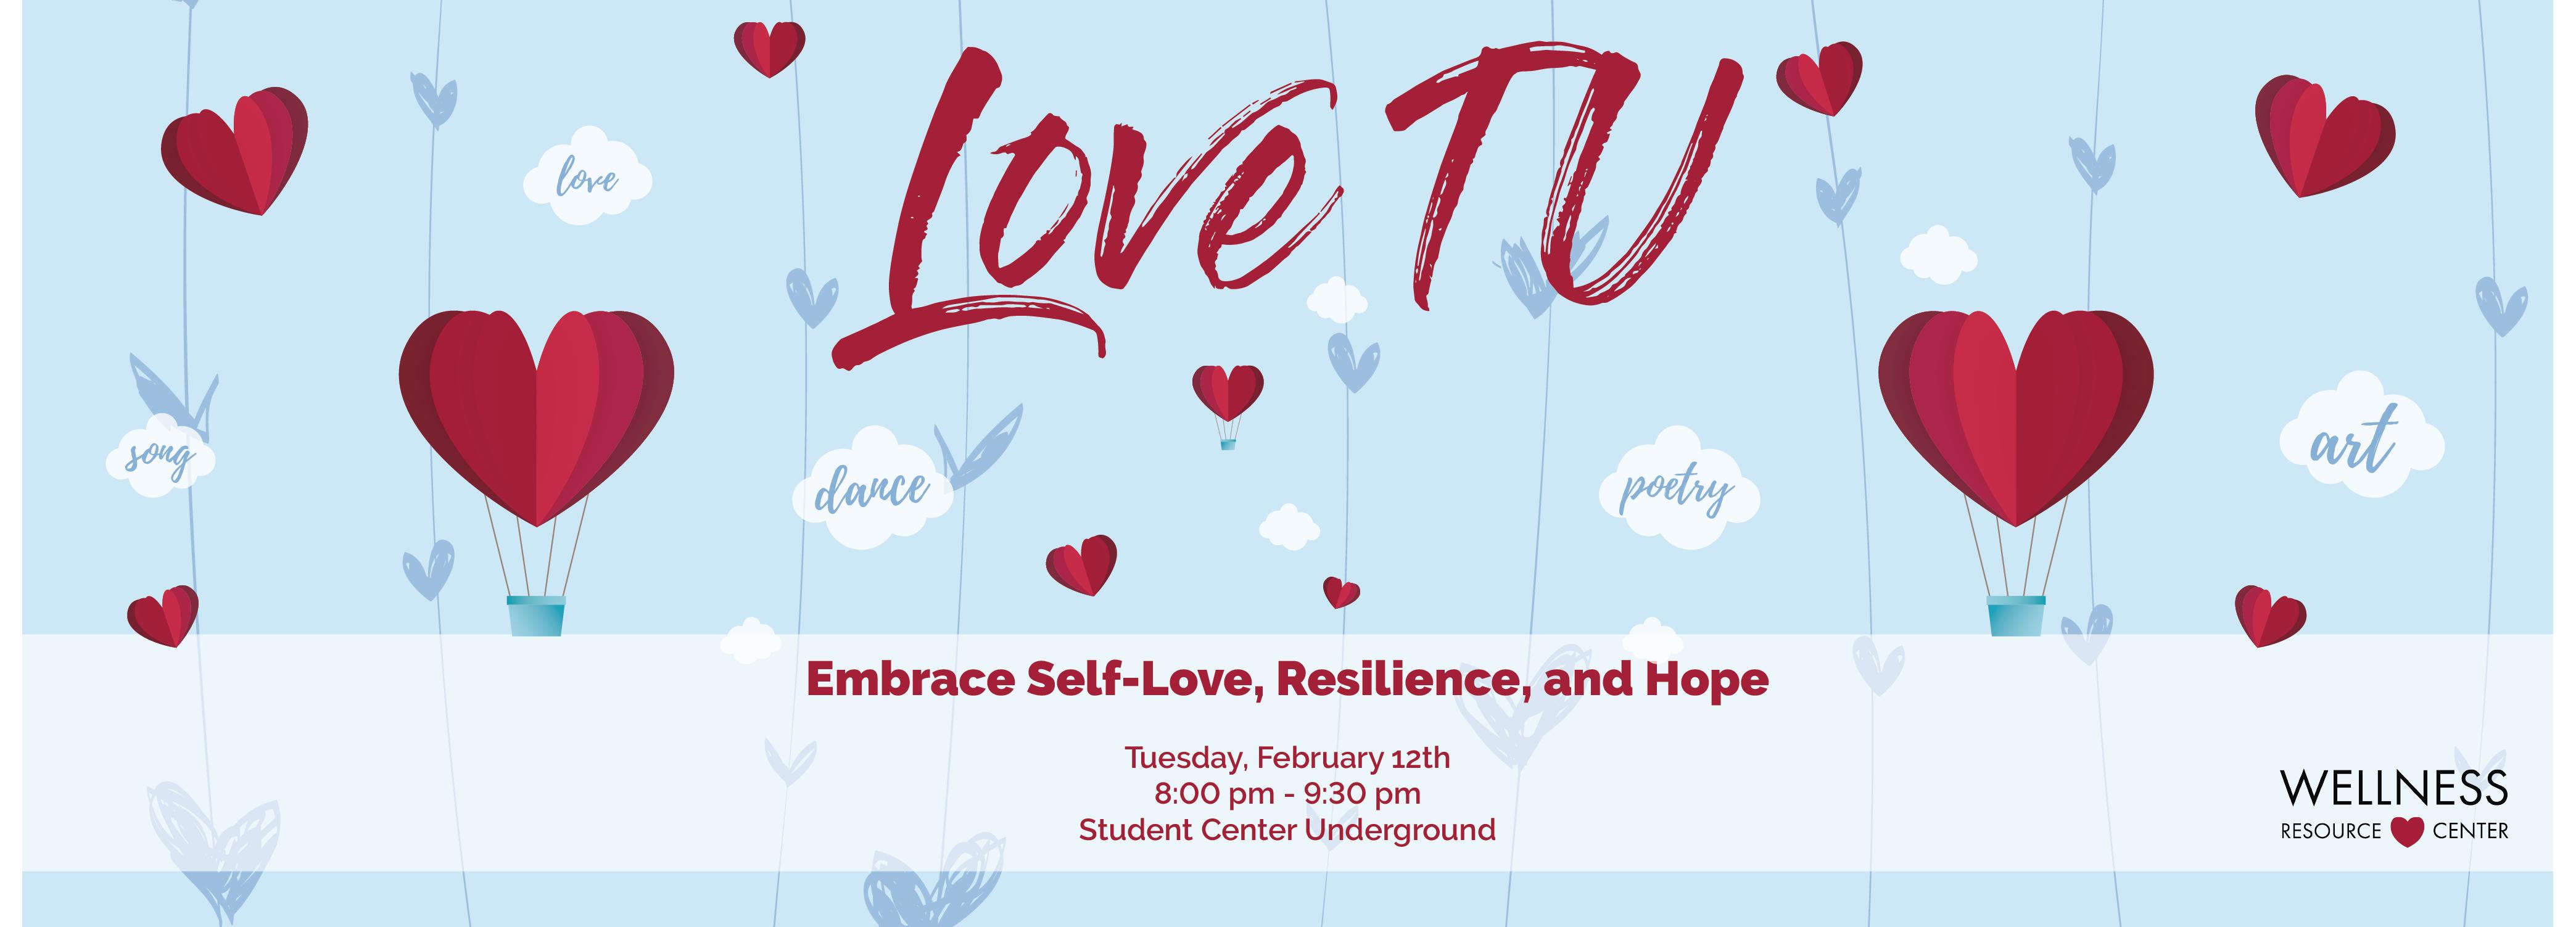 LoveTU Tuesday 2/12 8:00-9:30pm Student Center Underground